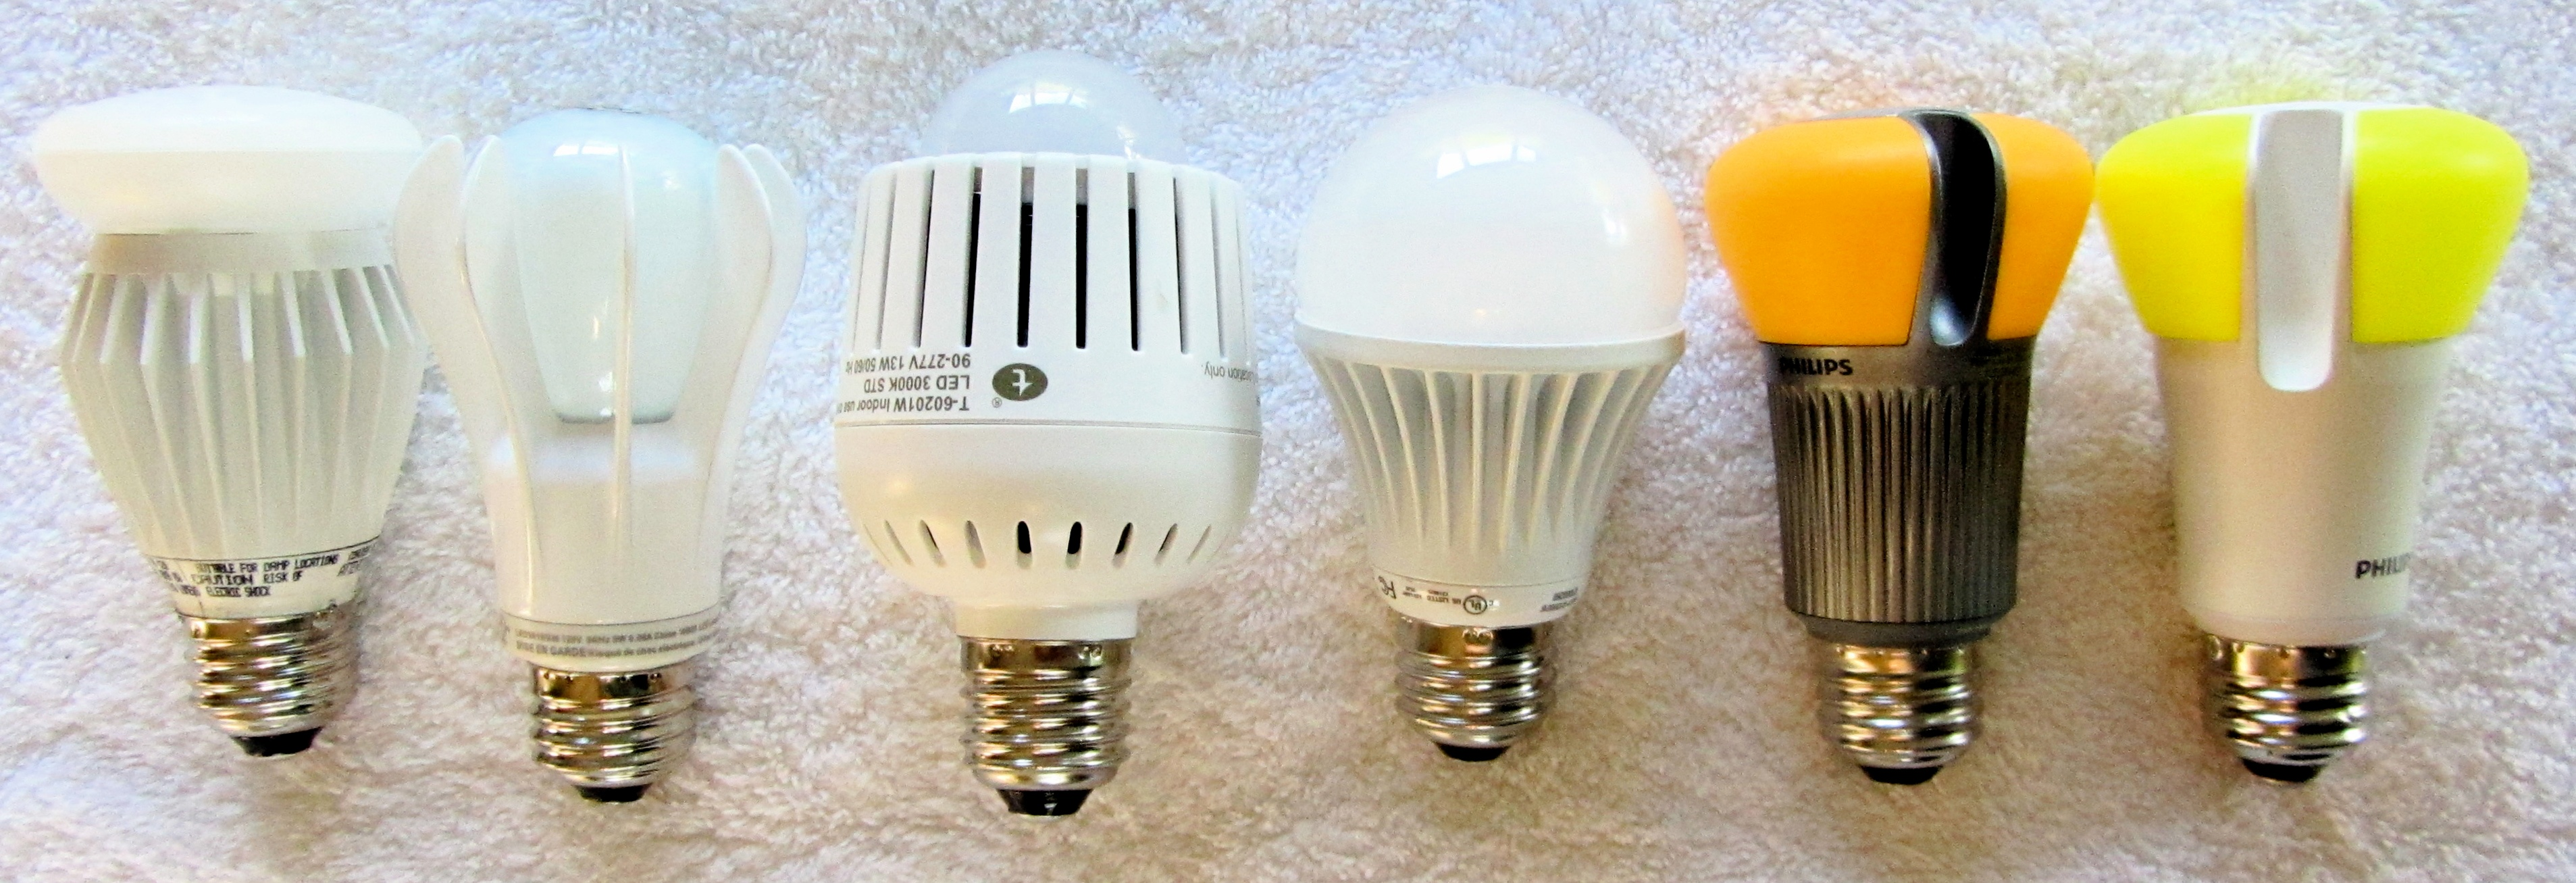 3 Benefits of Upgrading to LED Lighting